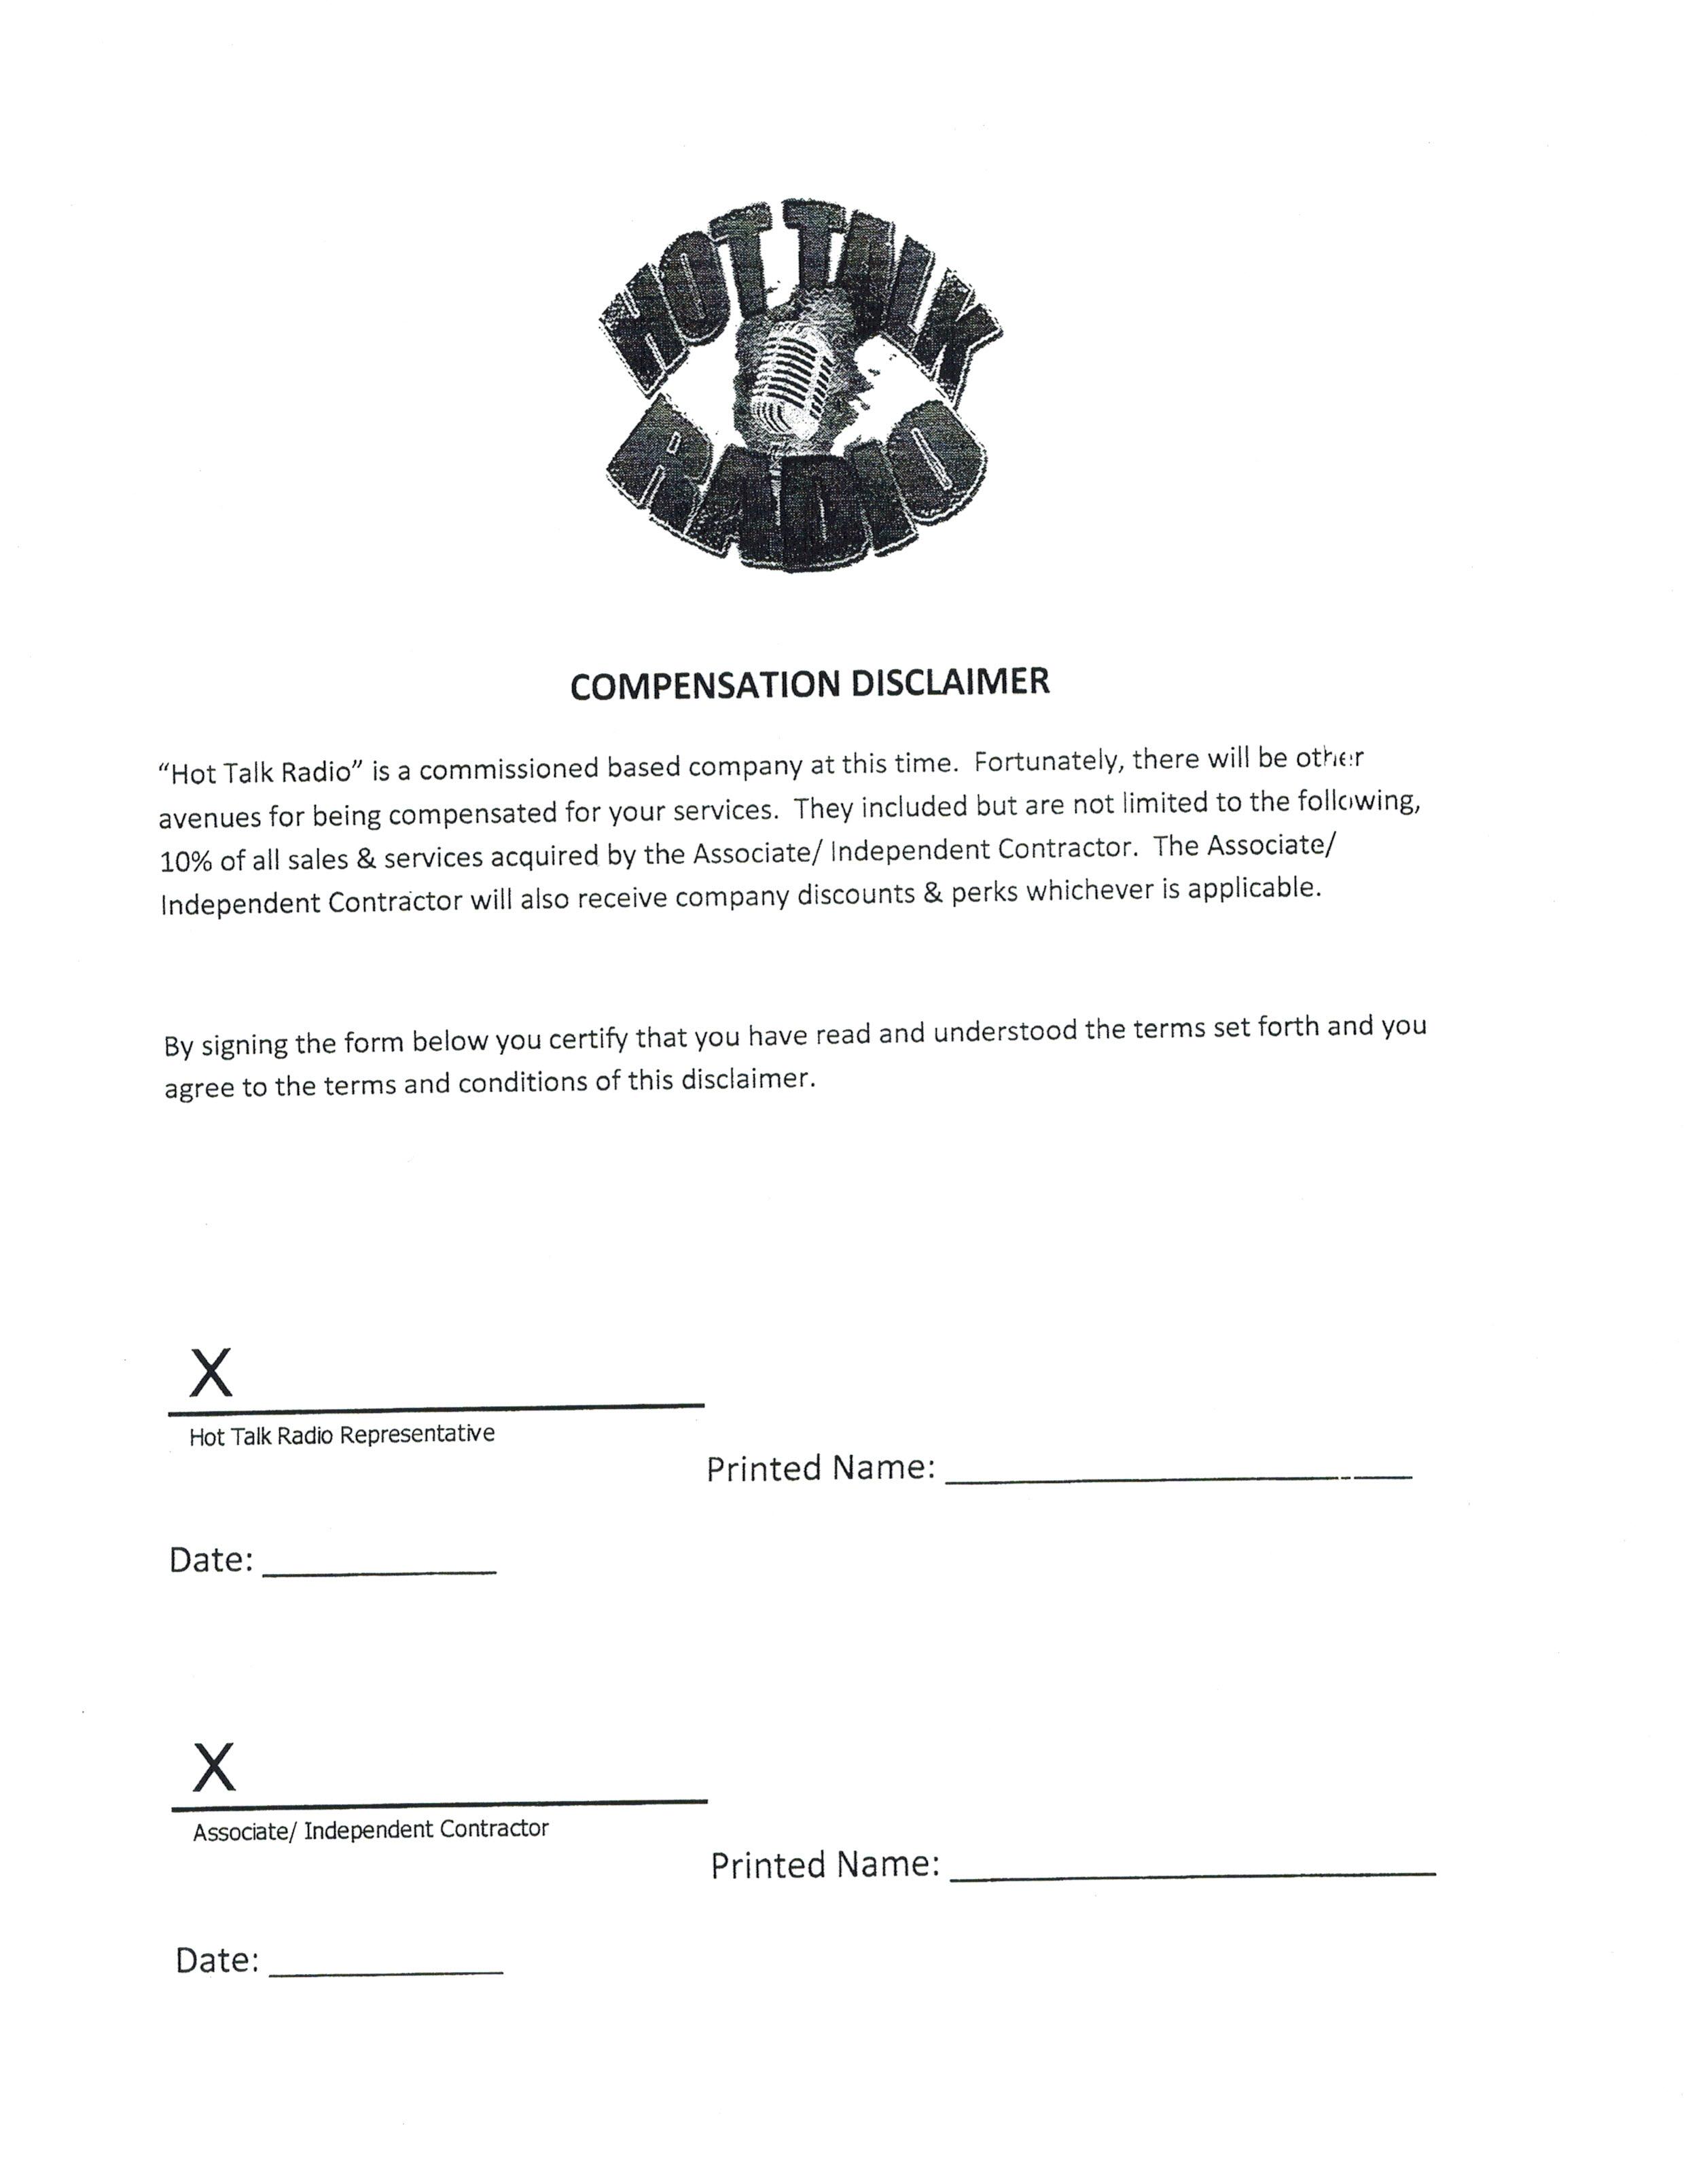 Compensation Disclaimer